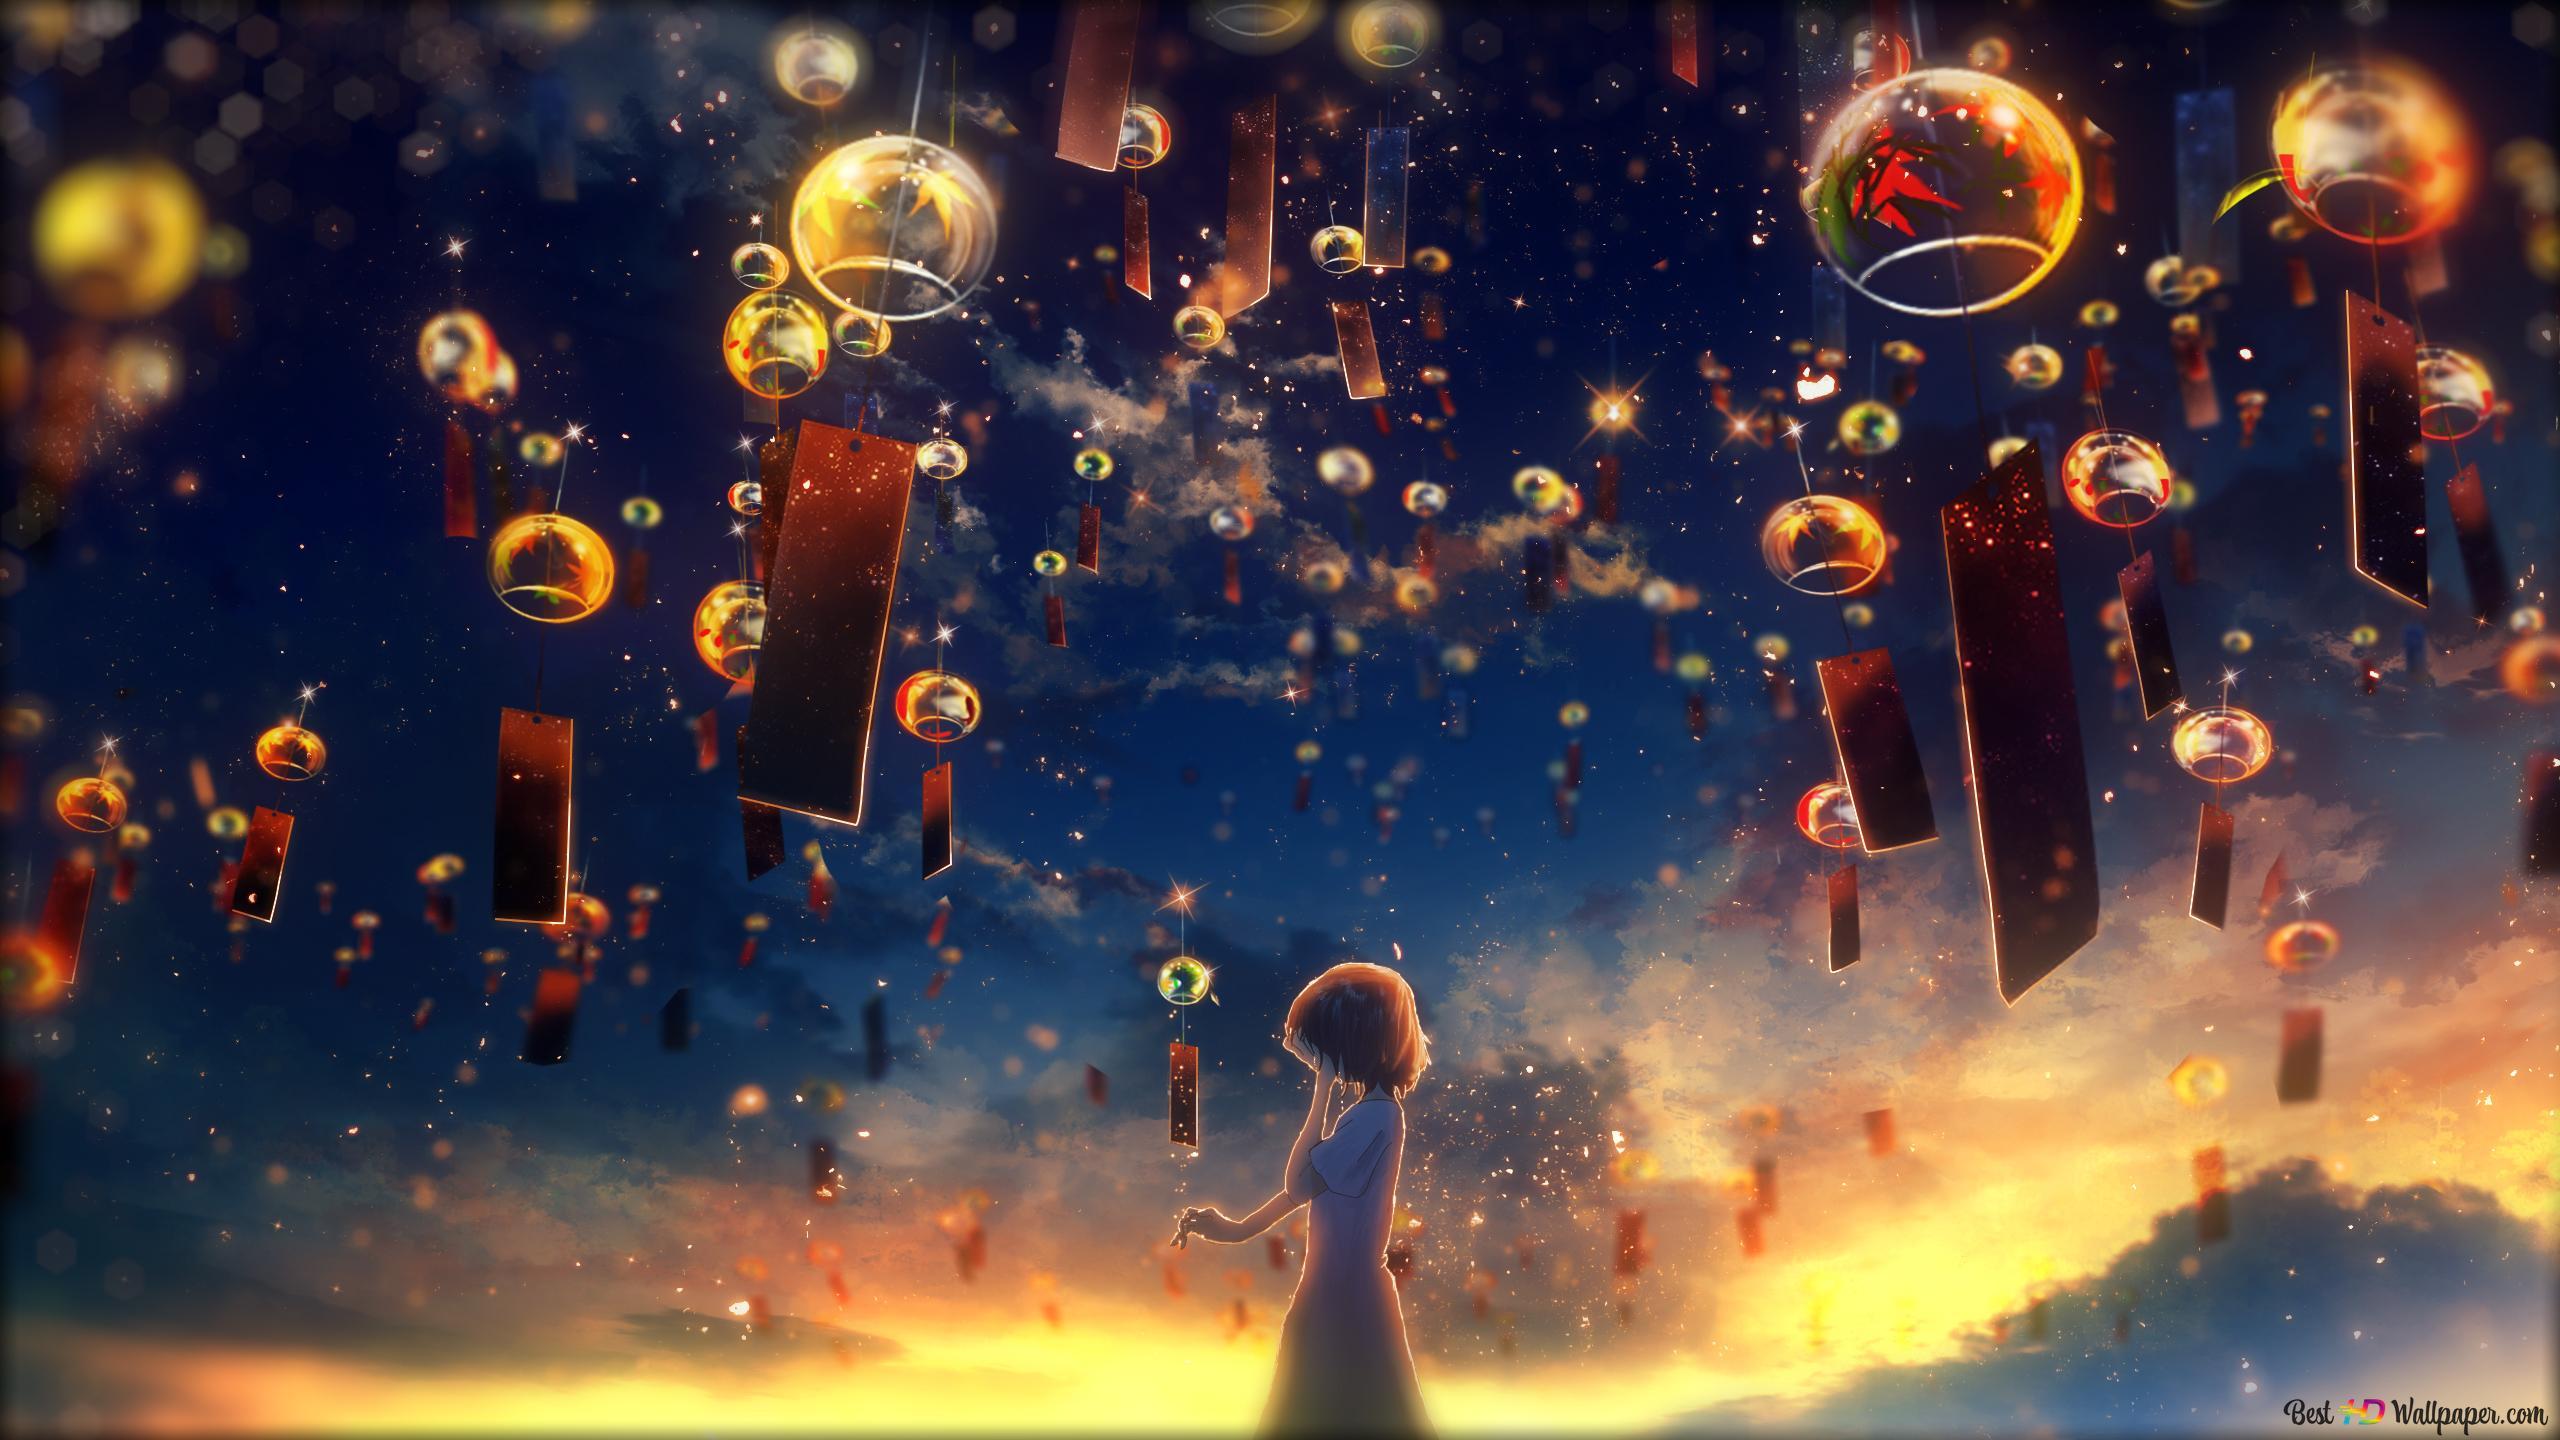 sky light lantern wallpaper 2560x1440 23843 51